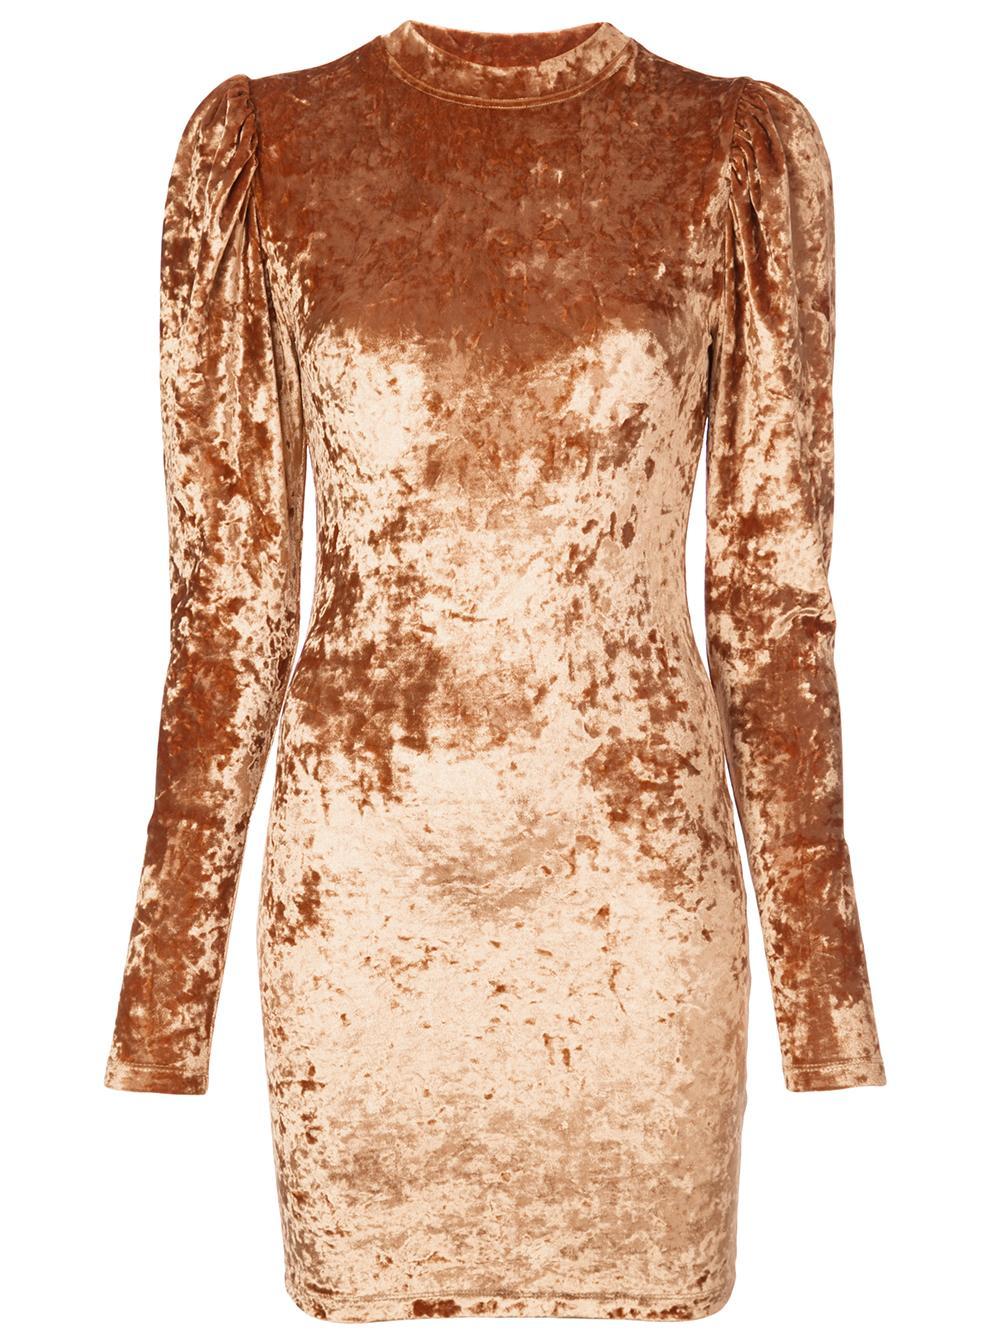 Lulu Velevt Mini Puff Shoulder L/S Dress Item # K209-CSV-F19